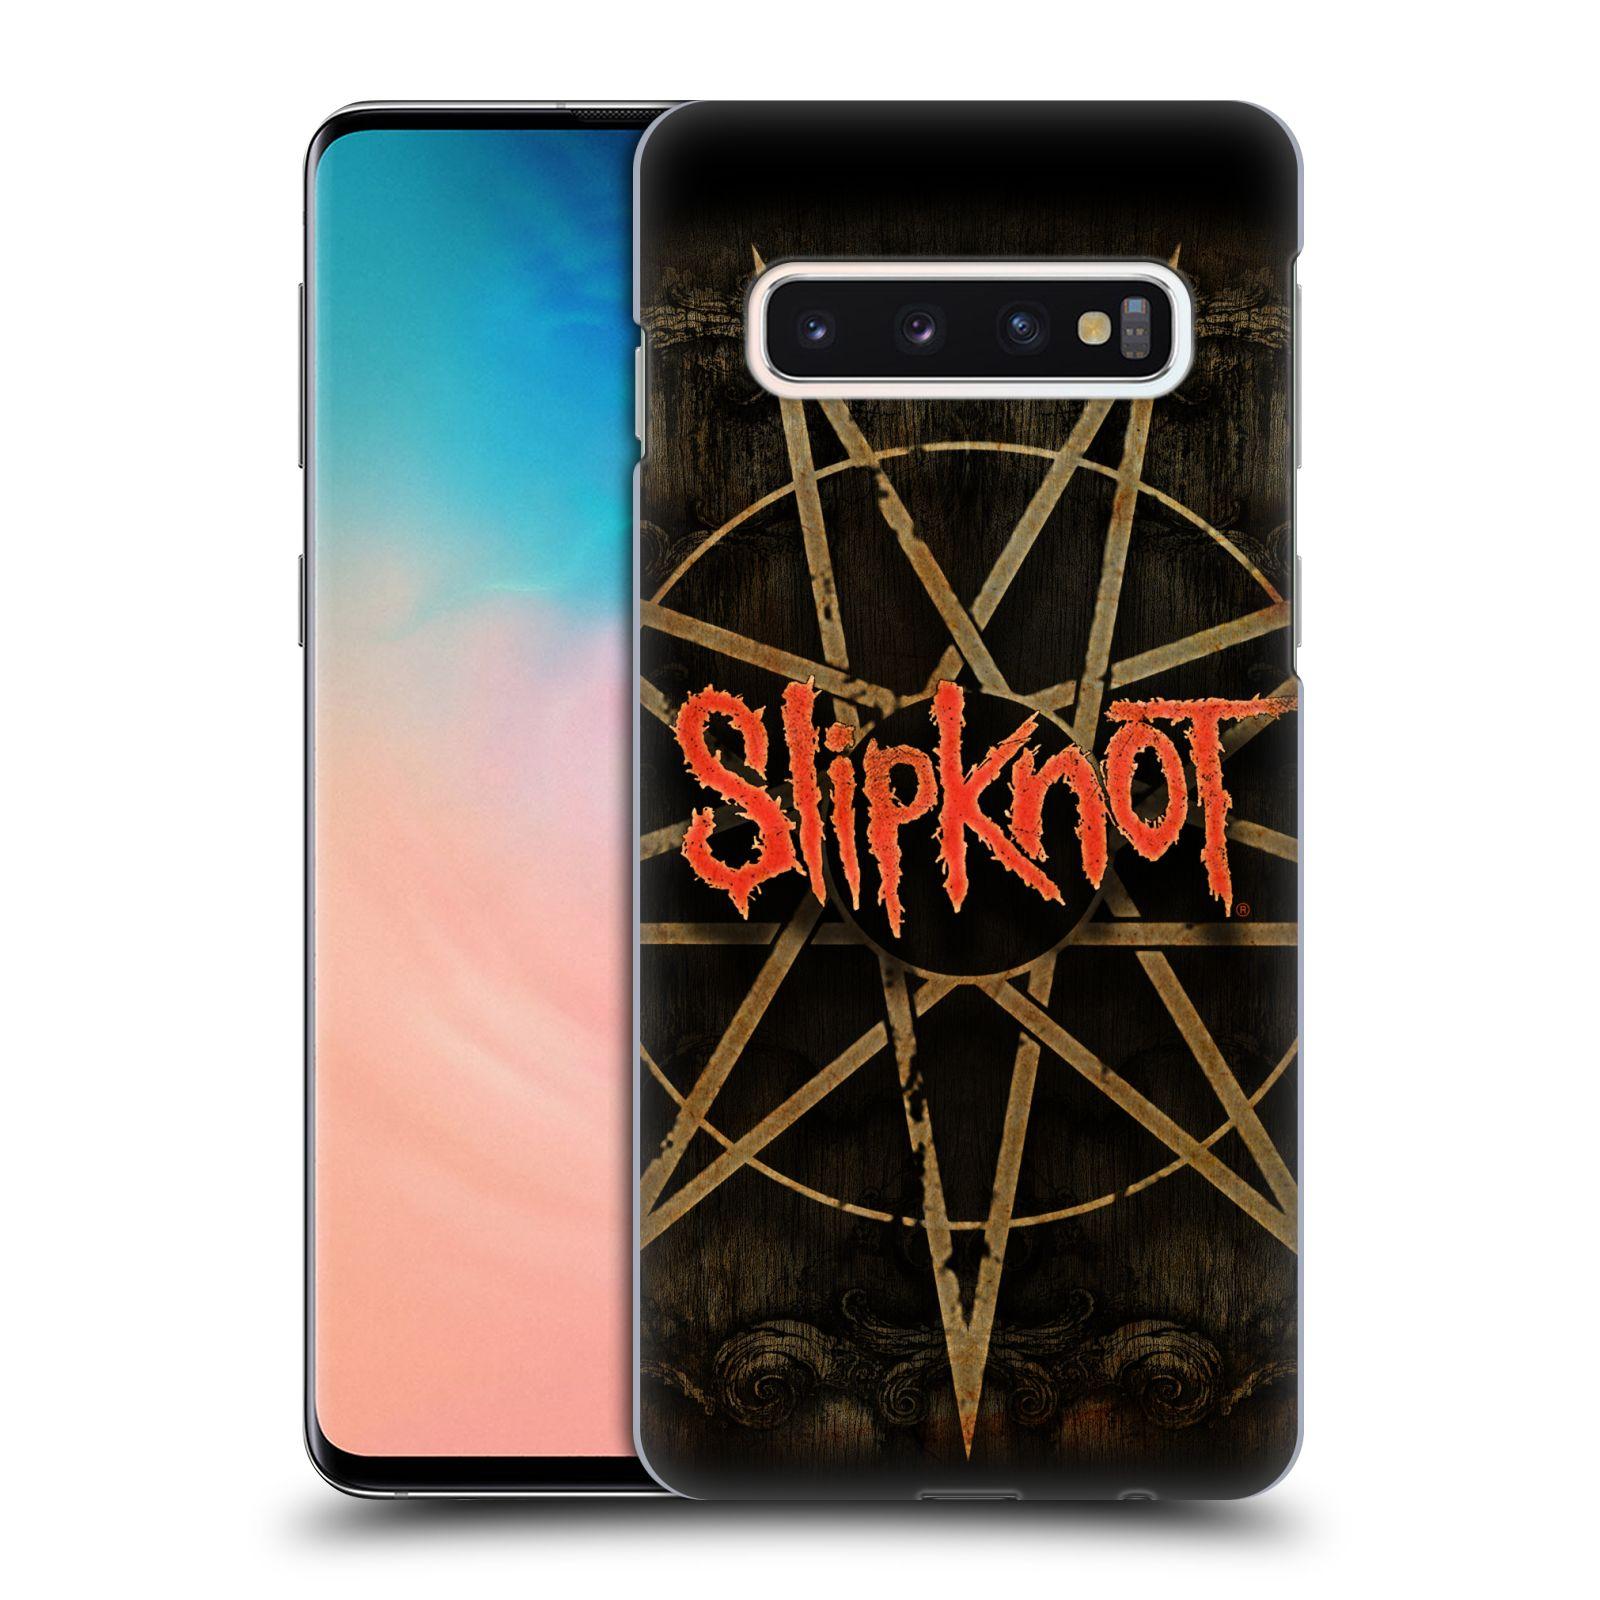 Plastové pouzdro na mobil Samsung Galaxy S10 - Head Case - Slipknot - Znak